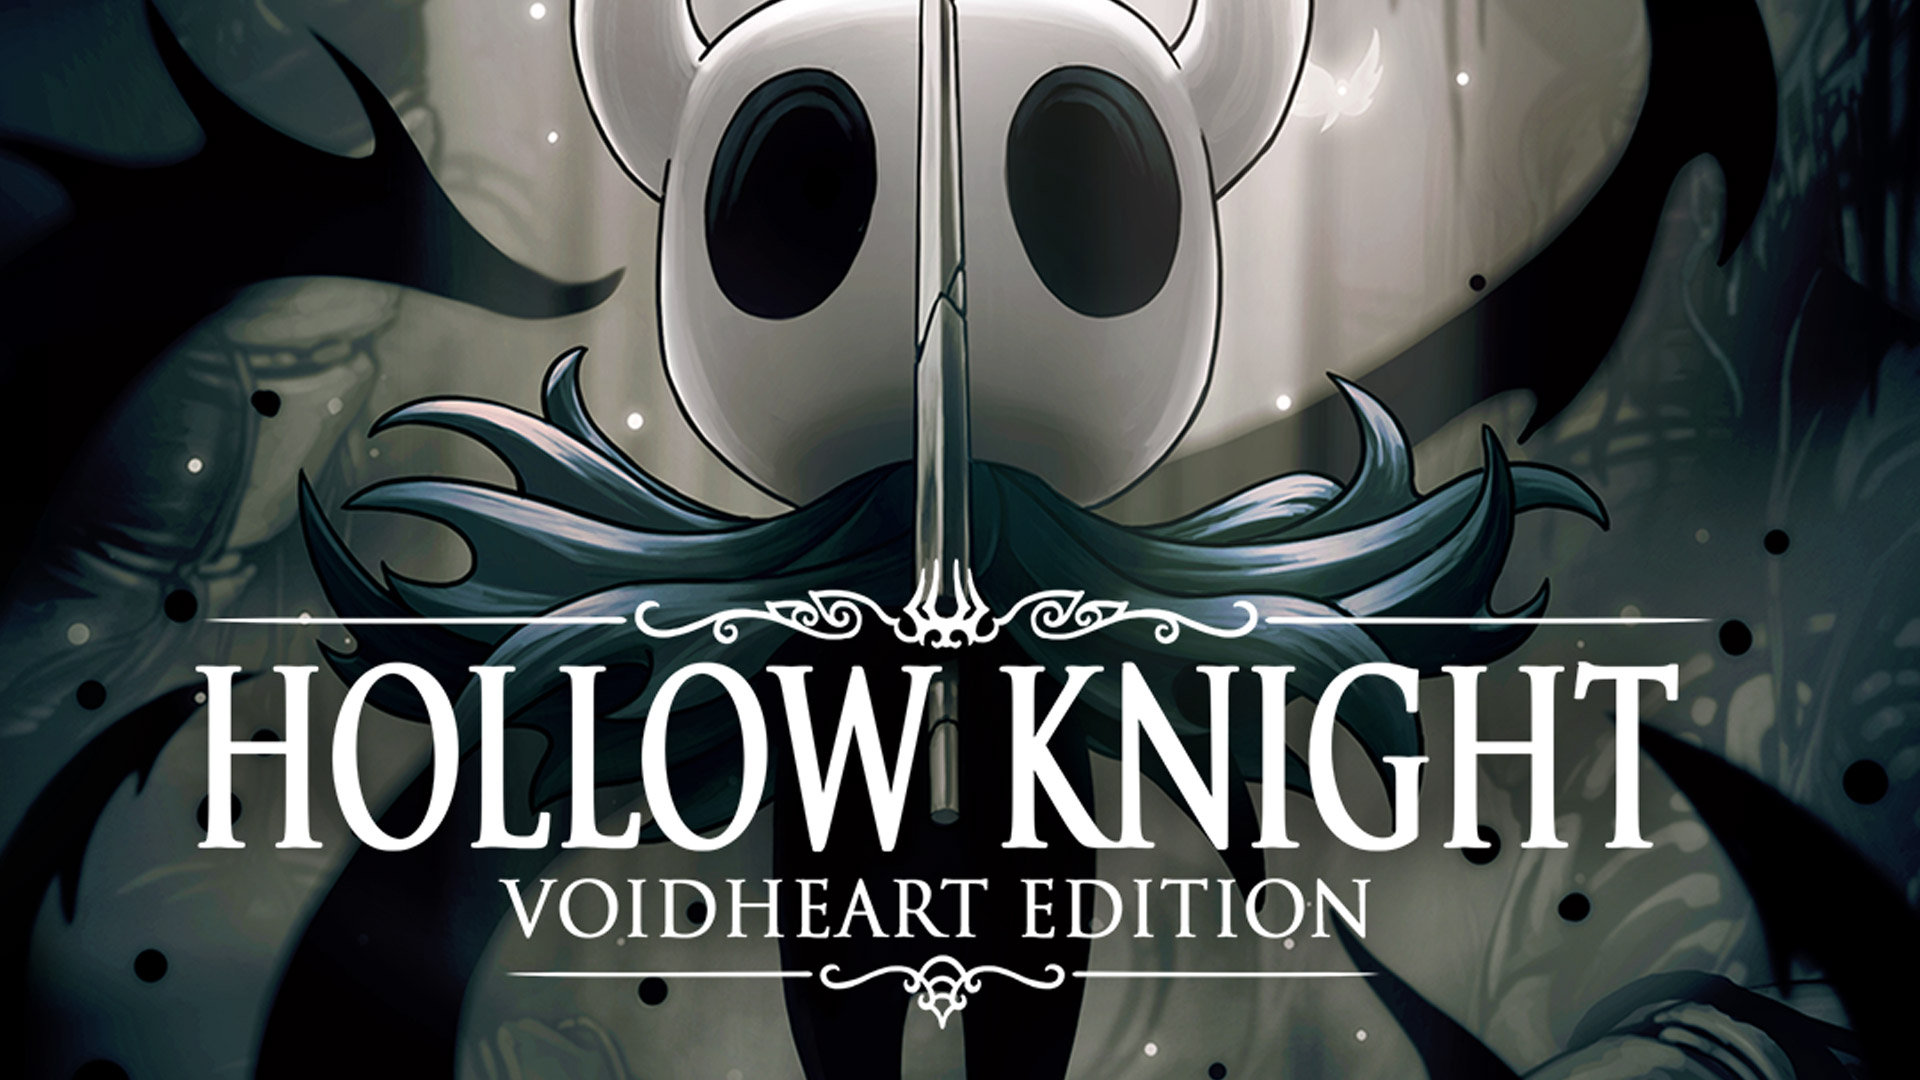 Hollow Knight Wallpaper in 1920x1080